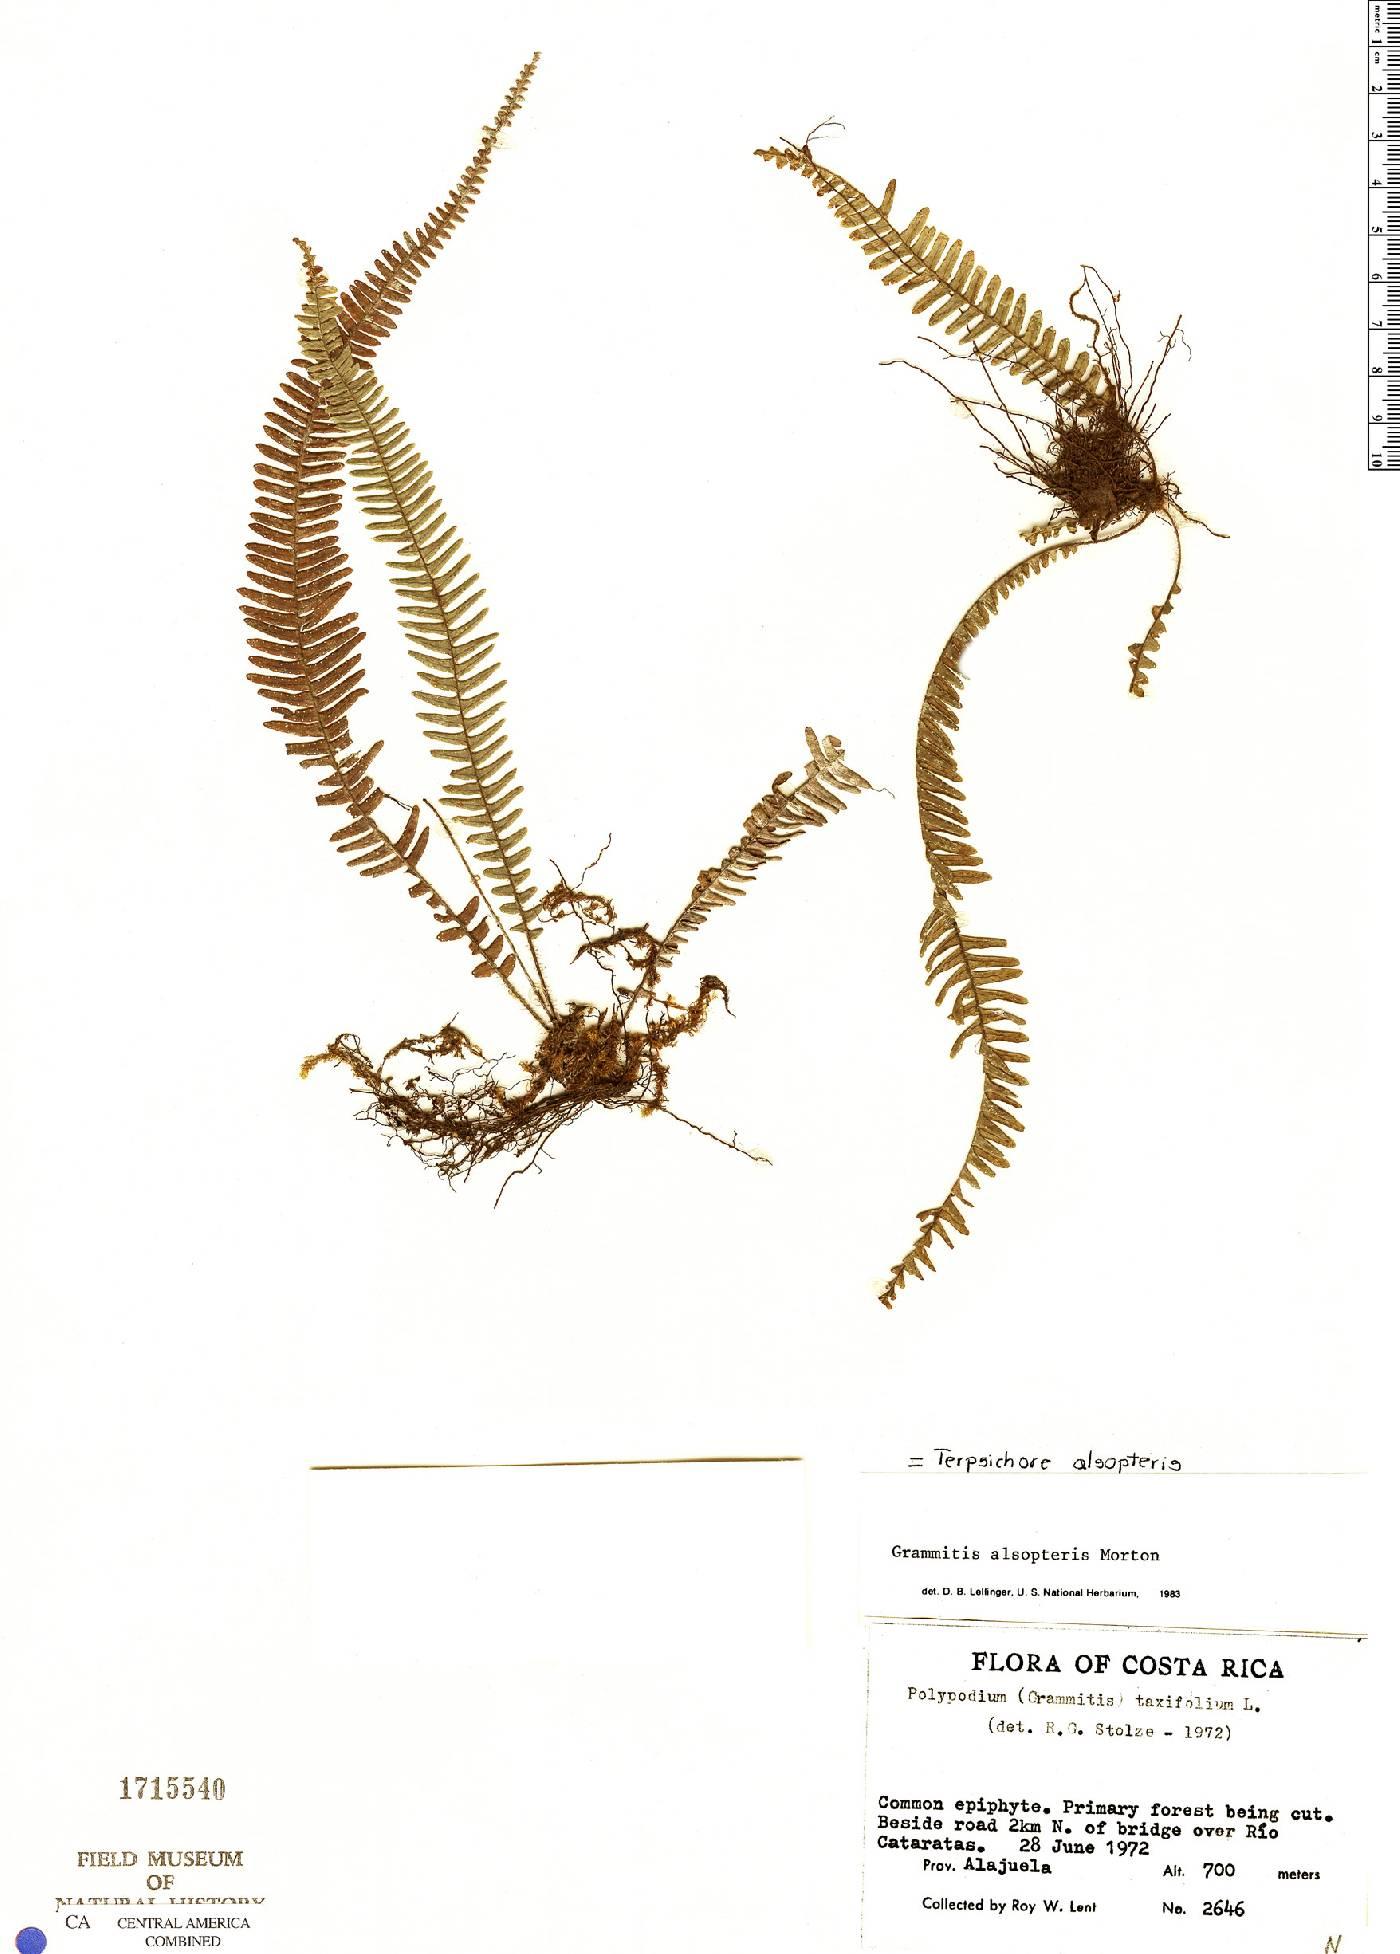 Terpsichore alsopteris image